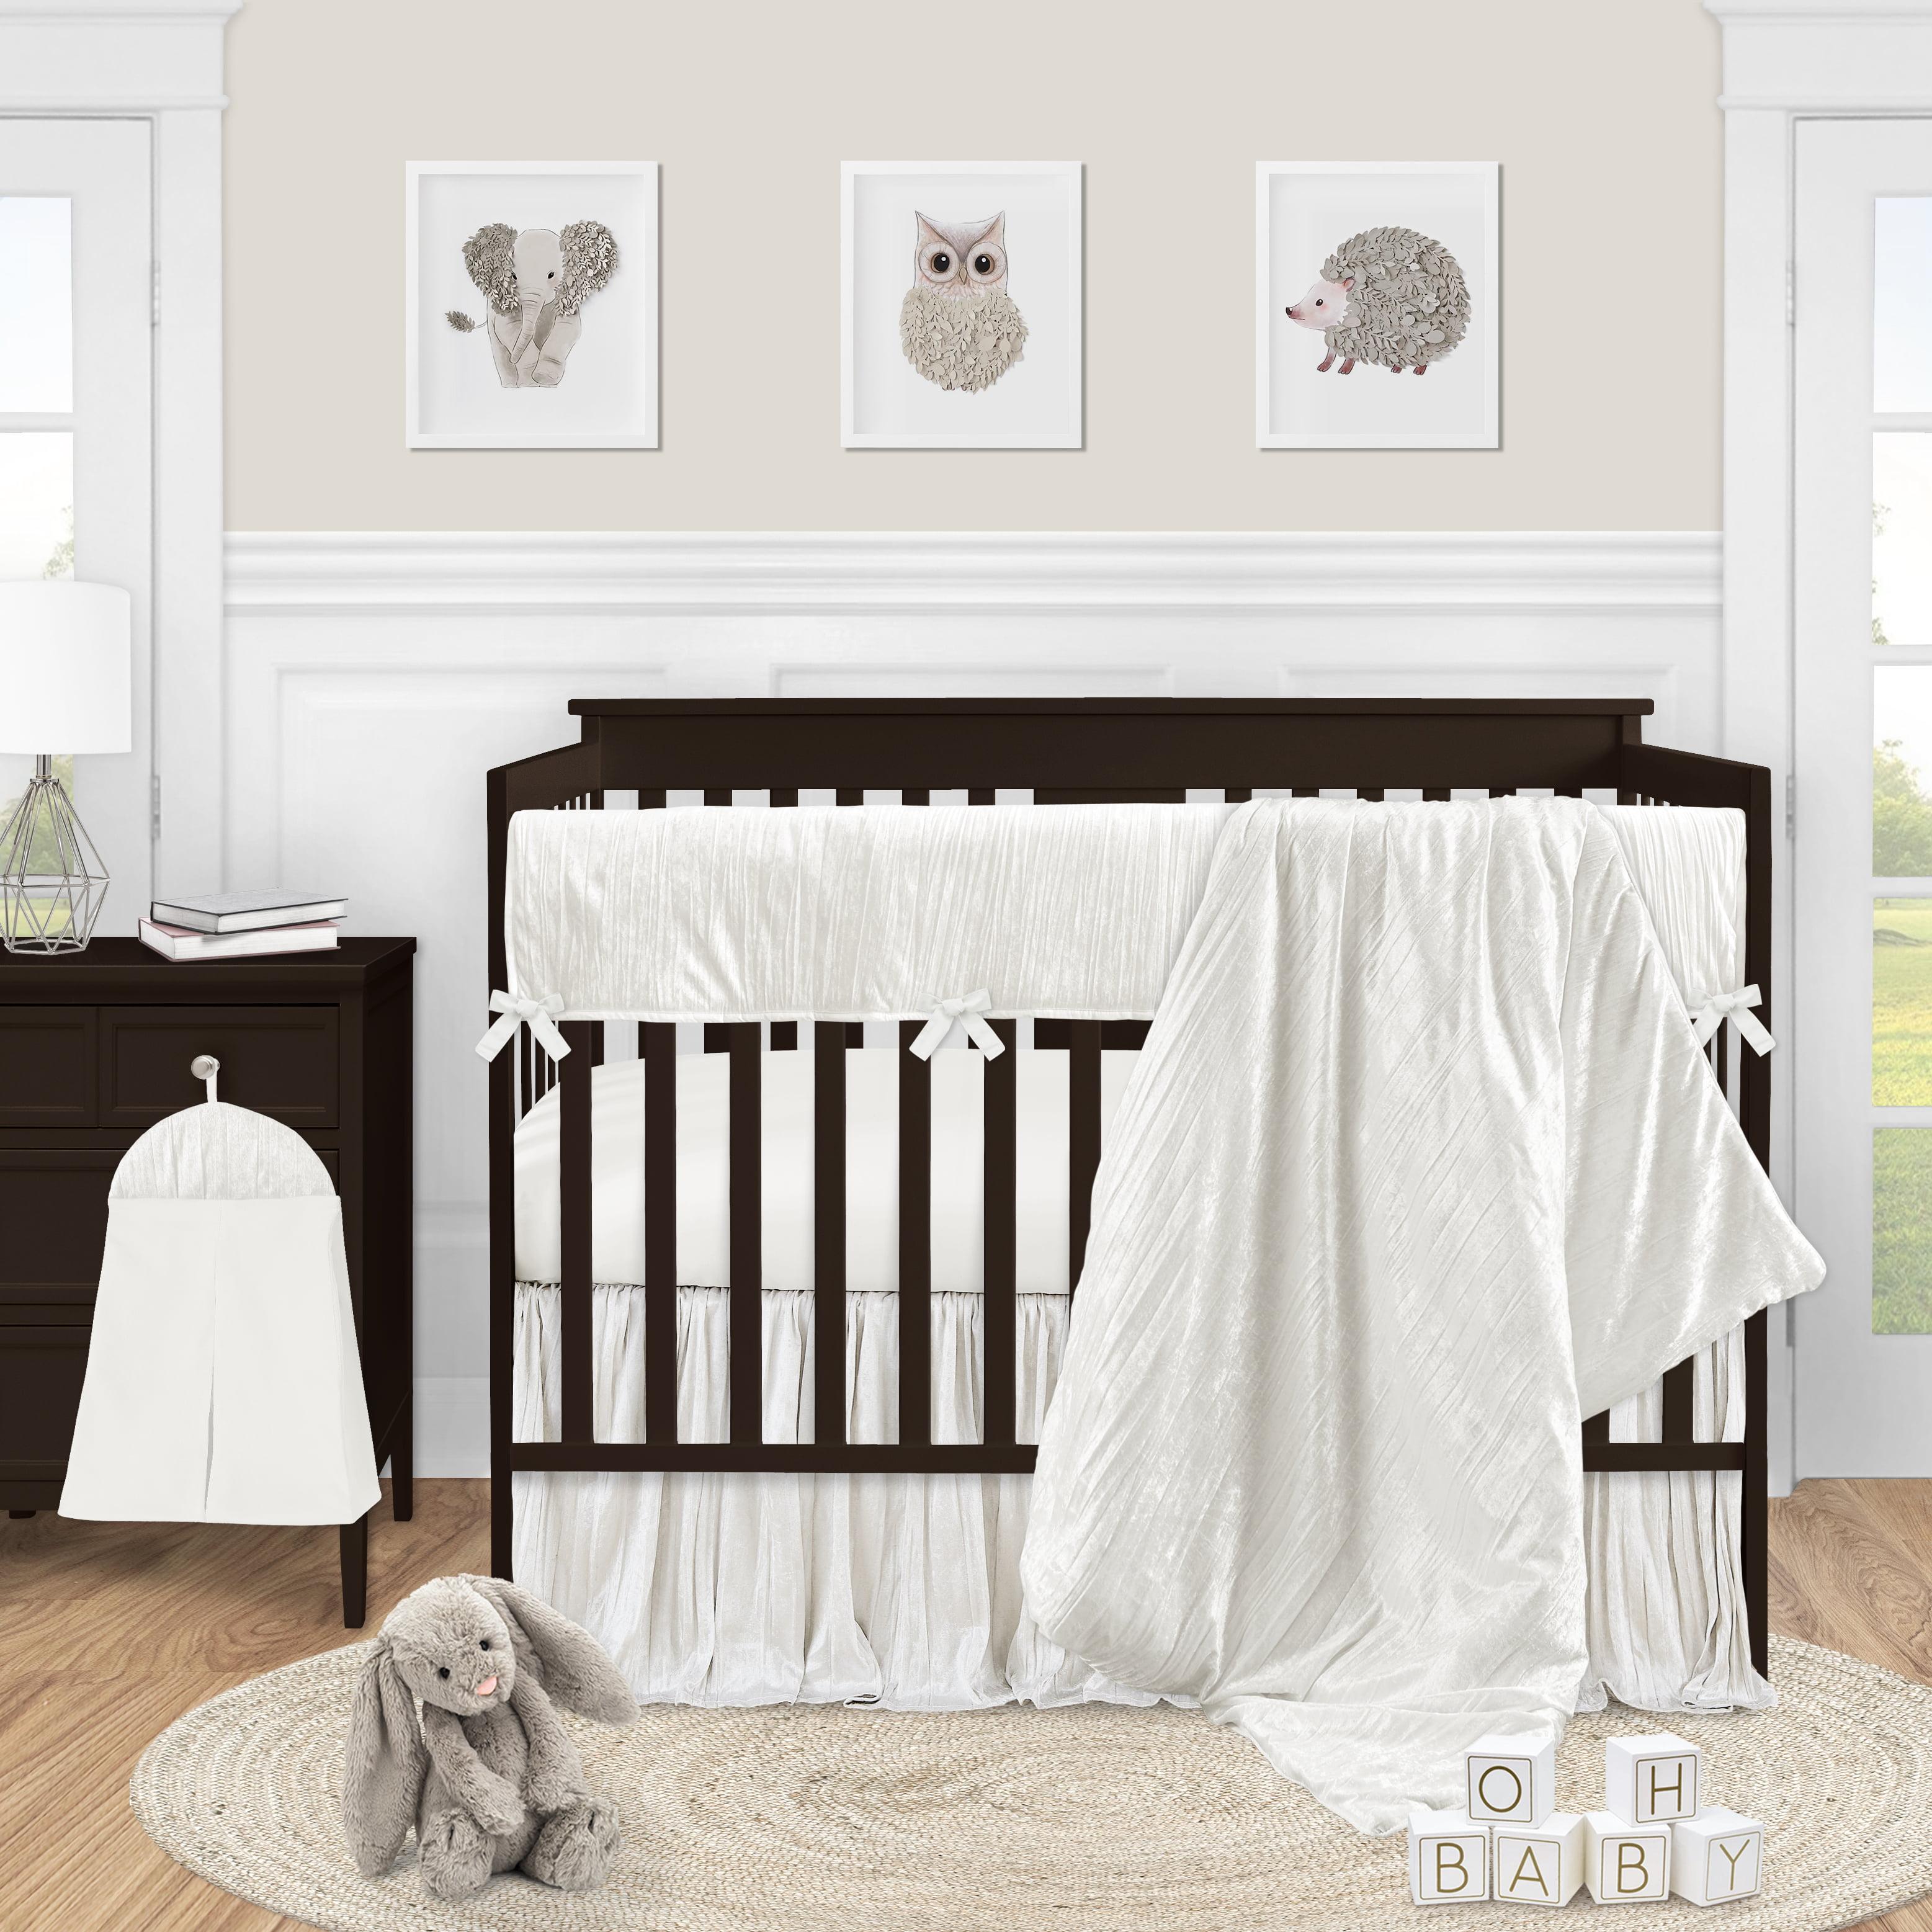 Sweet Jojo Designs Ivory Velvet Baby Girl Nursery Crib Bedding Set 5 Pieces Solid Color Off White Cream Crinkle Crushed Luxurious Elegant Boho Shabby Chic Vintage Luxury Princess Boutique Designer